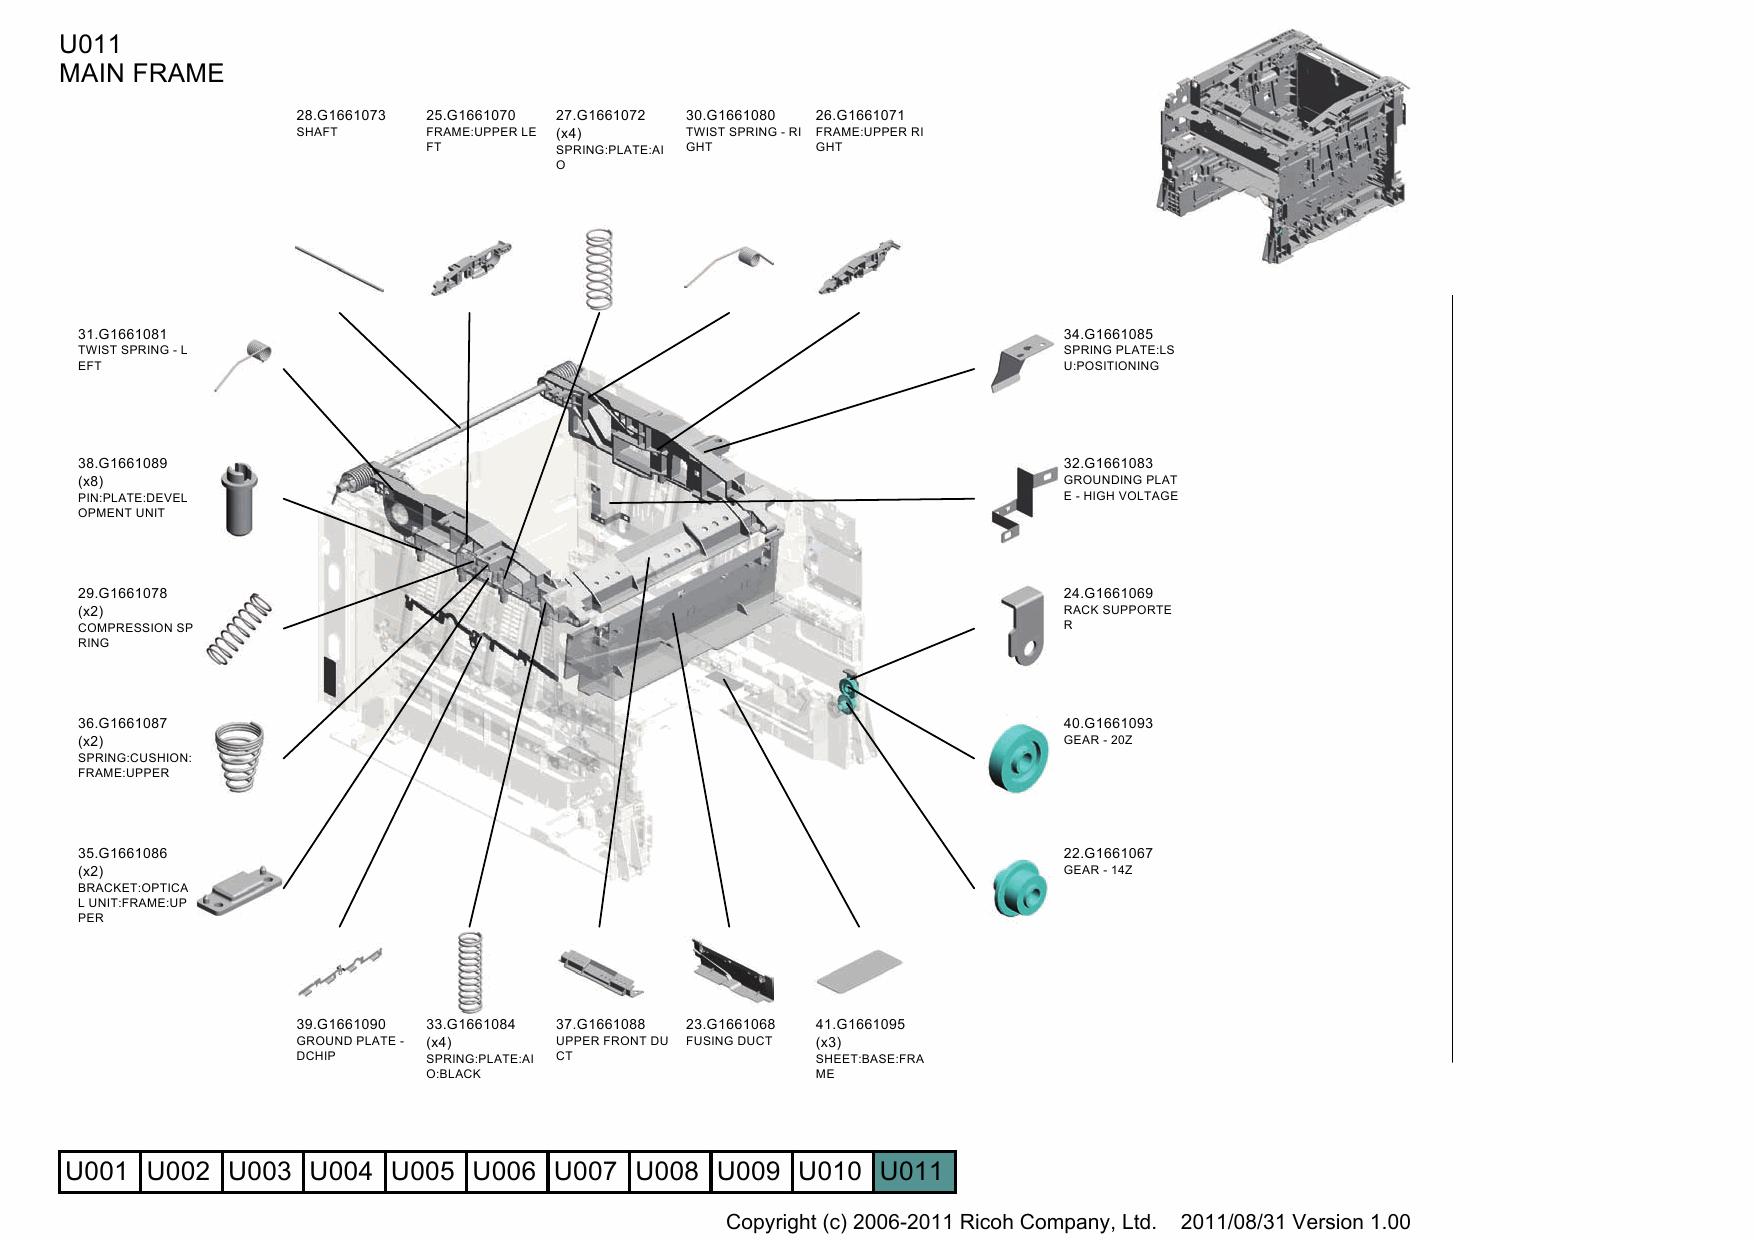 Ricoh aficio sp 100 printer